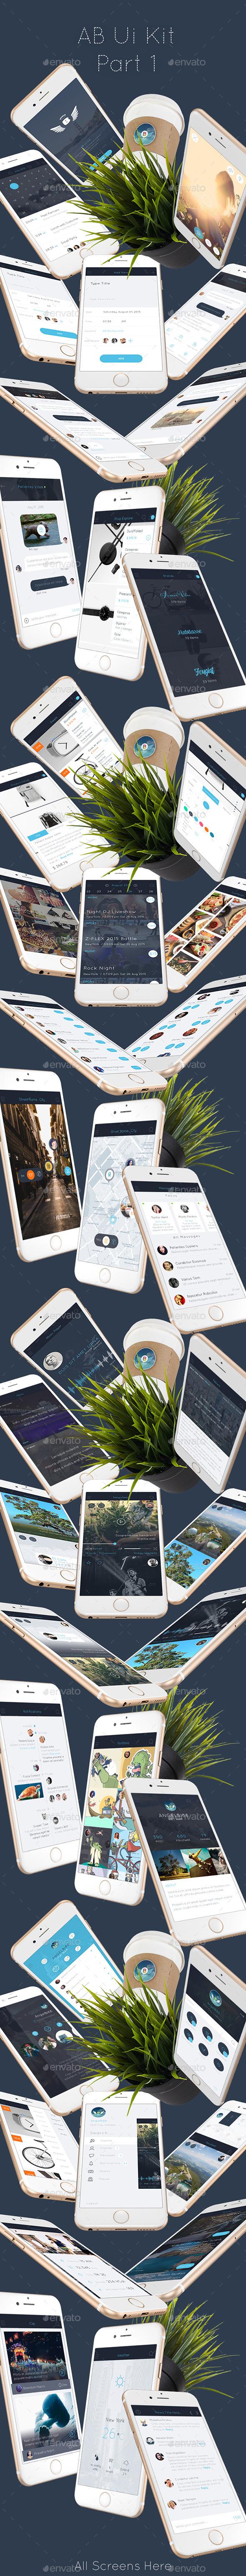 AB1 Mobile UI Kit - User Interfaces Web Elements